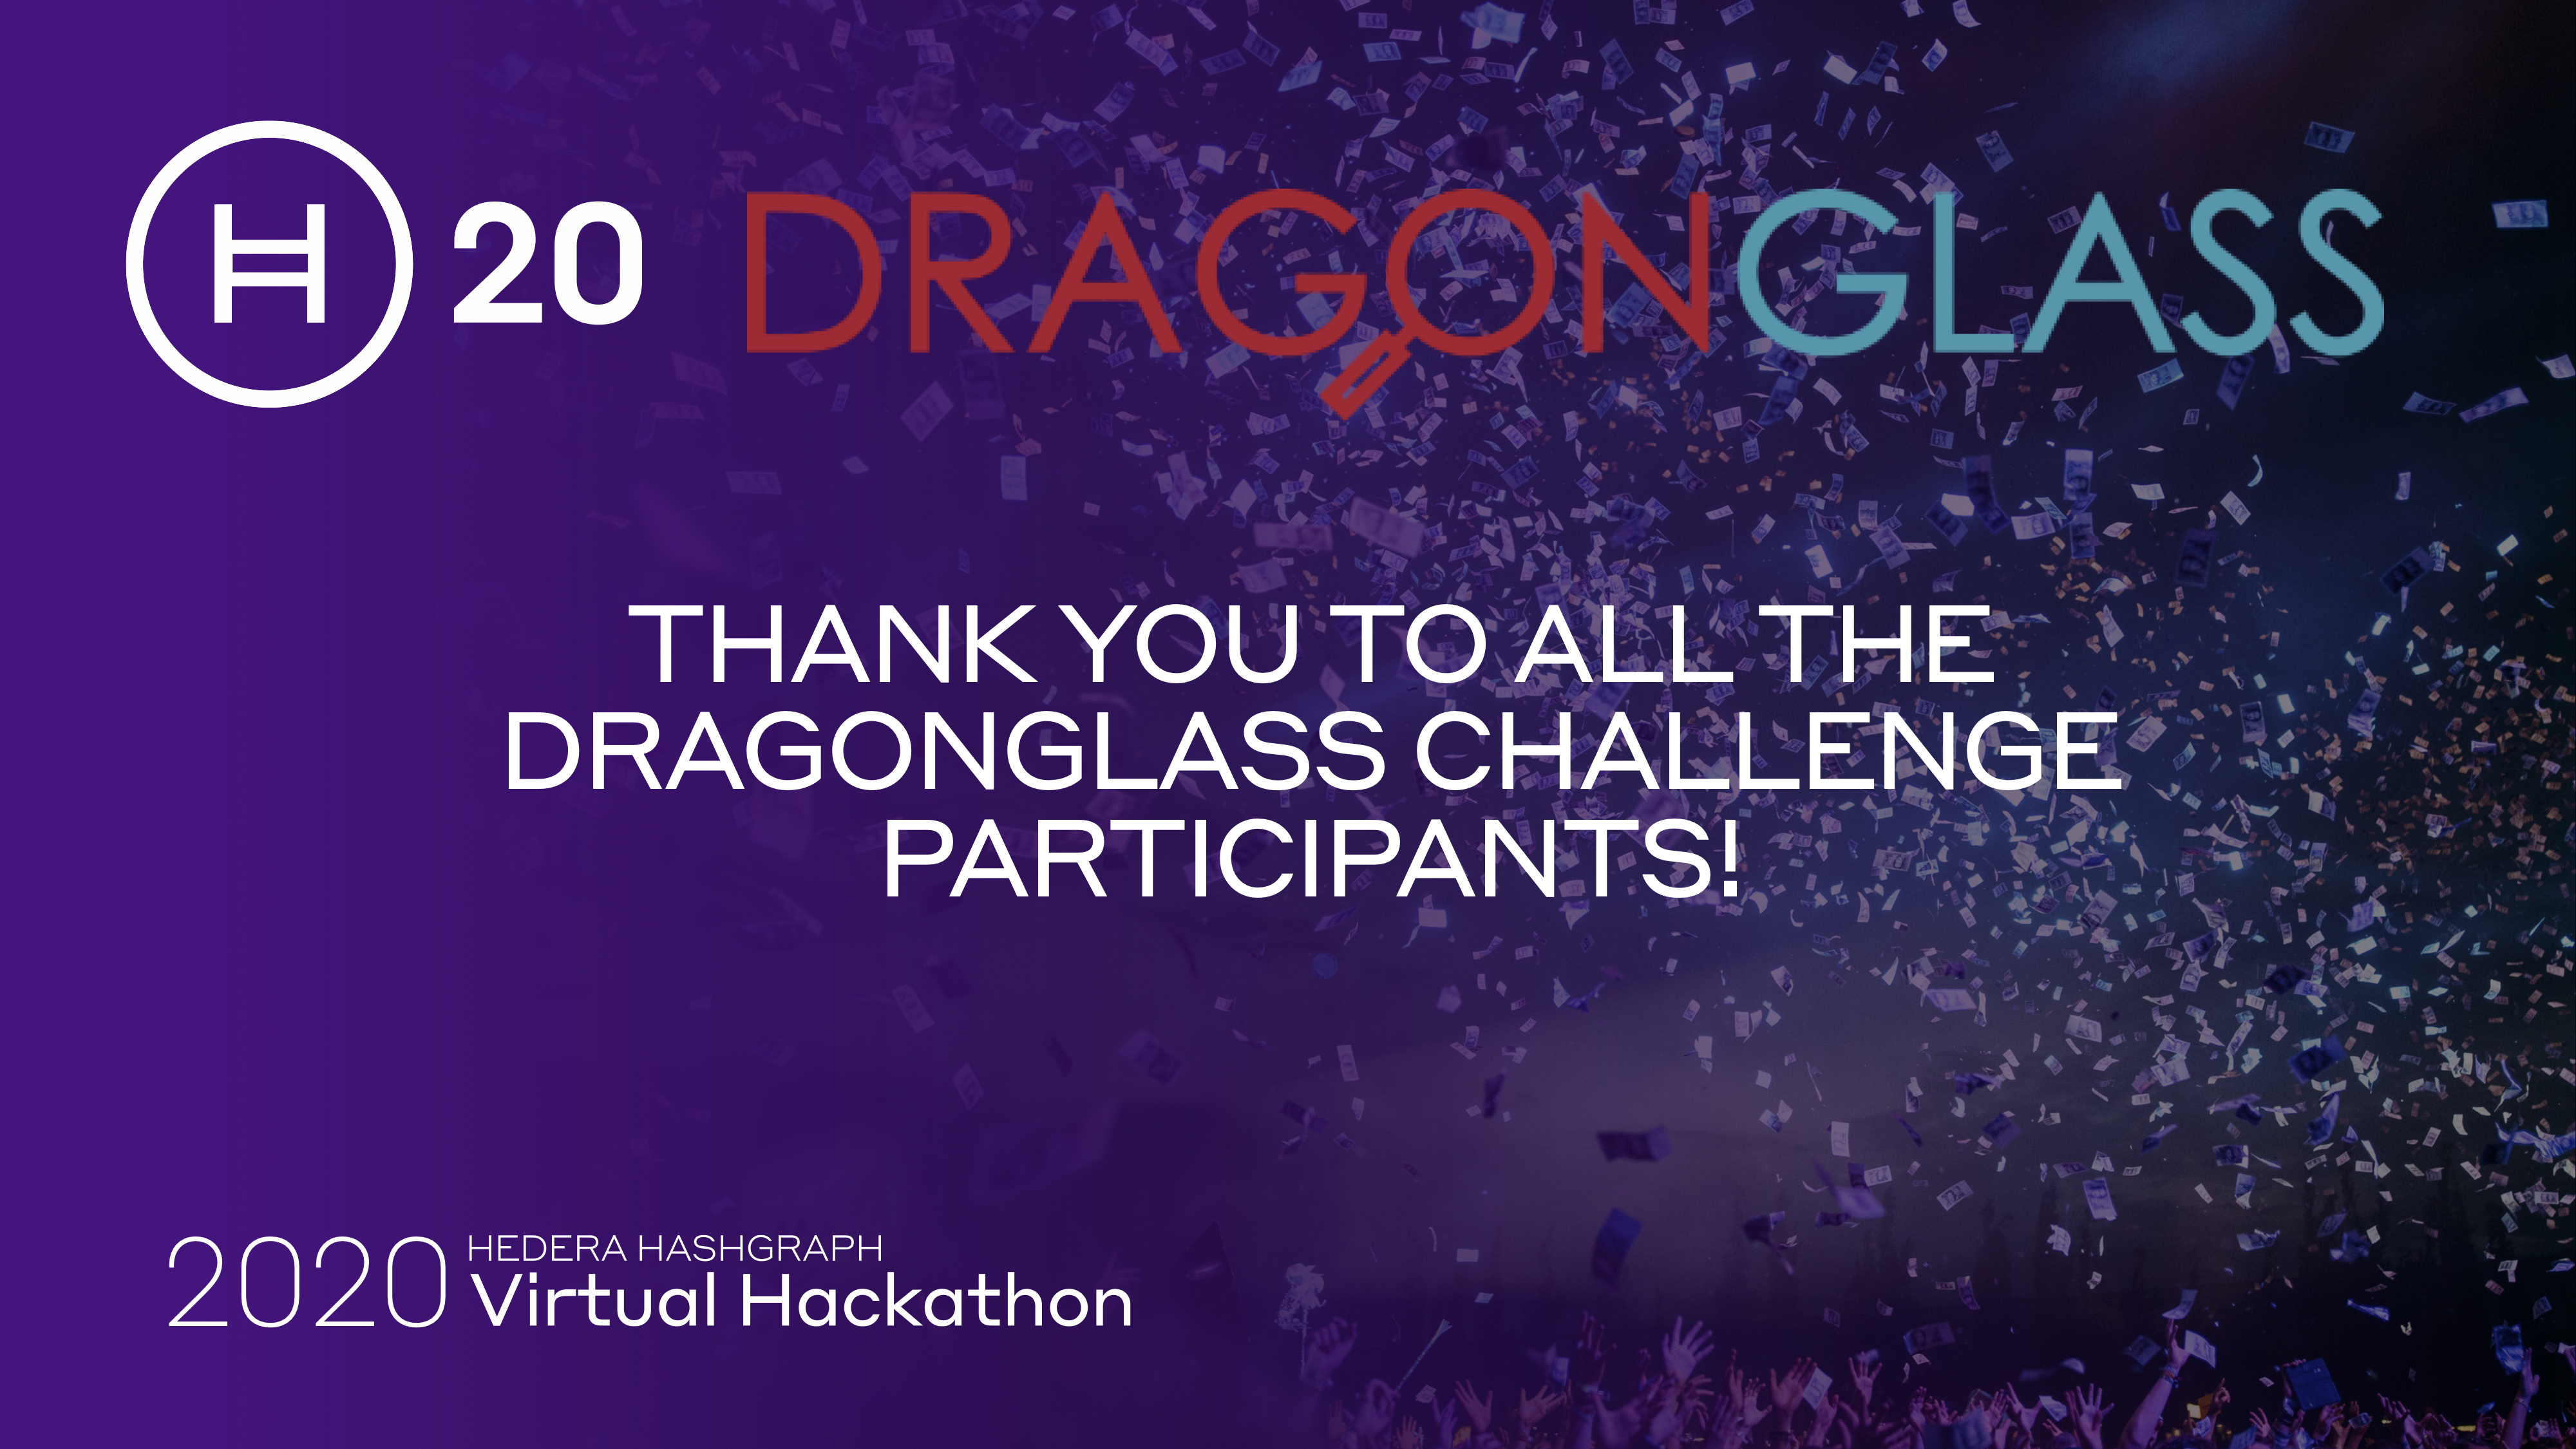 dragonglass congrats